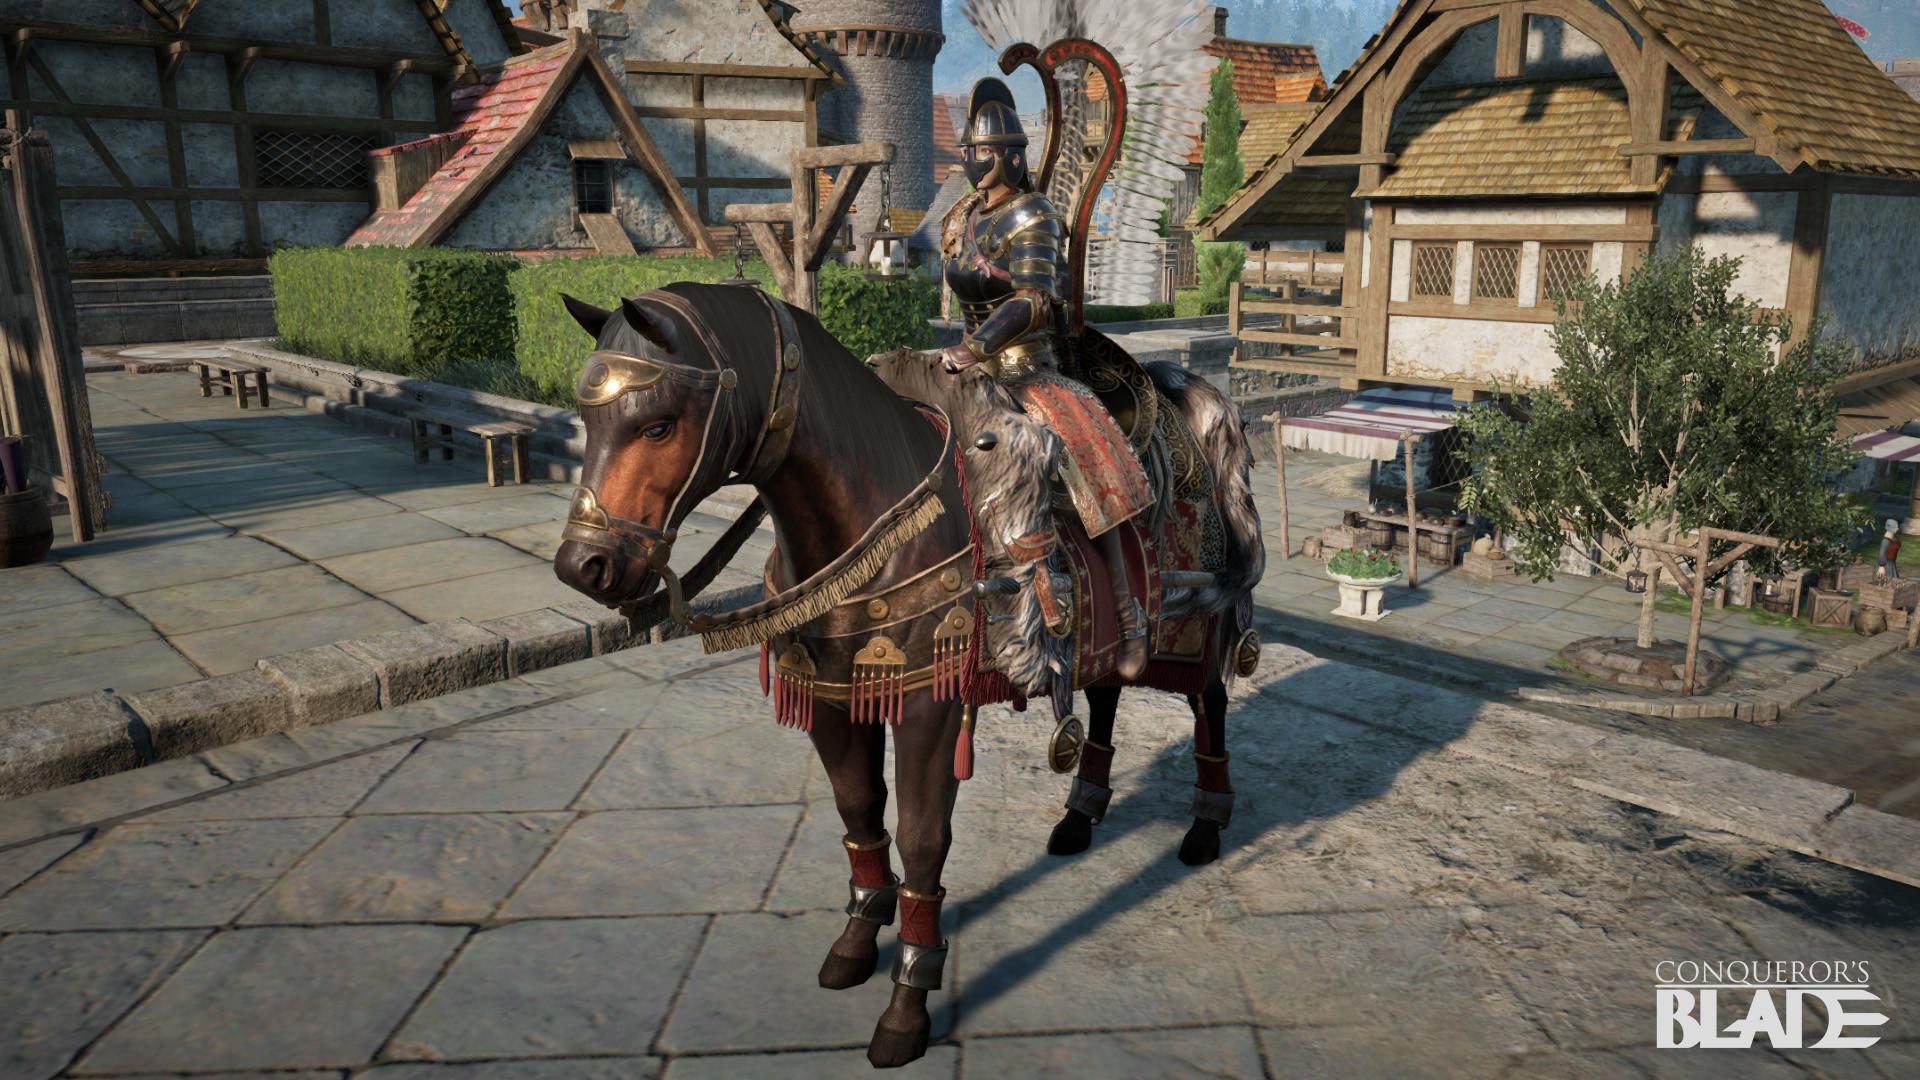 Conqueror's Blade - Hussar Hero Collector's Pack Fiyat Karşılaştırma